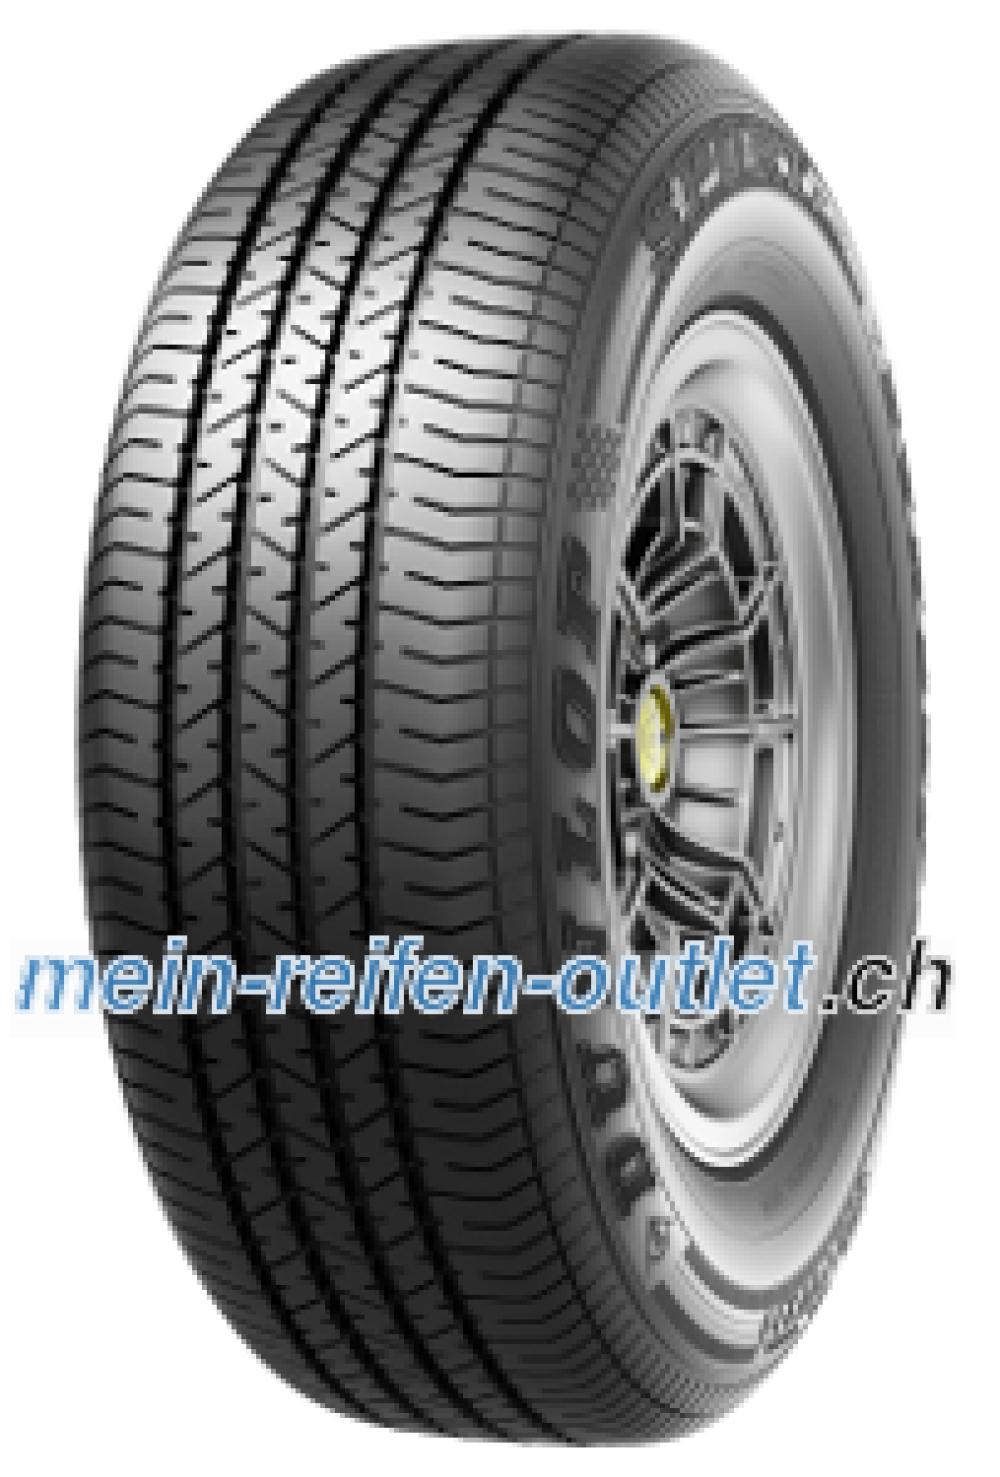 Dunlop Sport Classic ( 185/70 R15 89V )